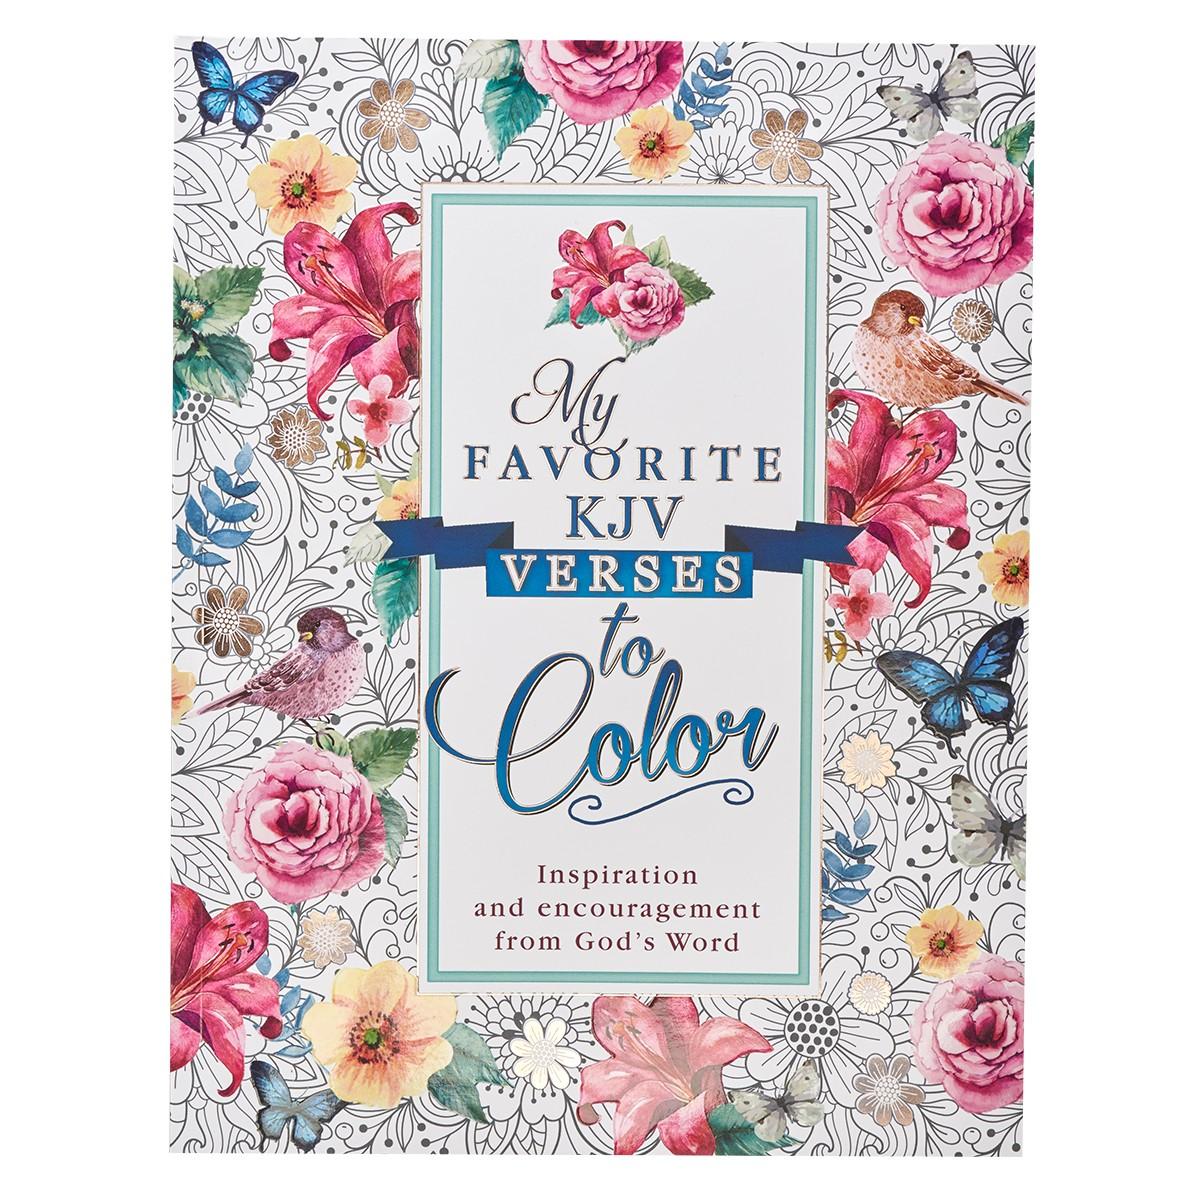 - My Favorite KJV Verses To Color Coloring Book.